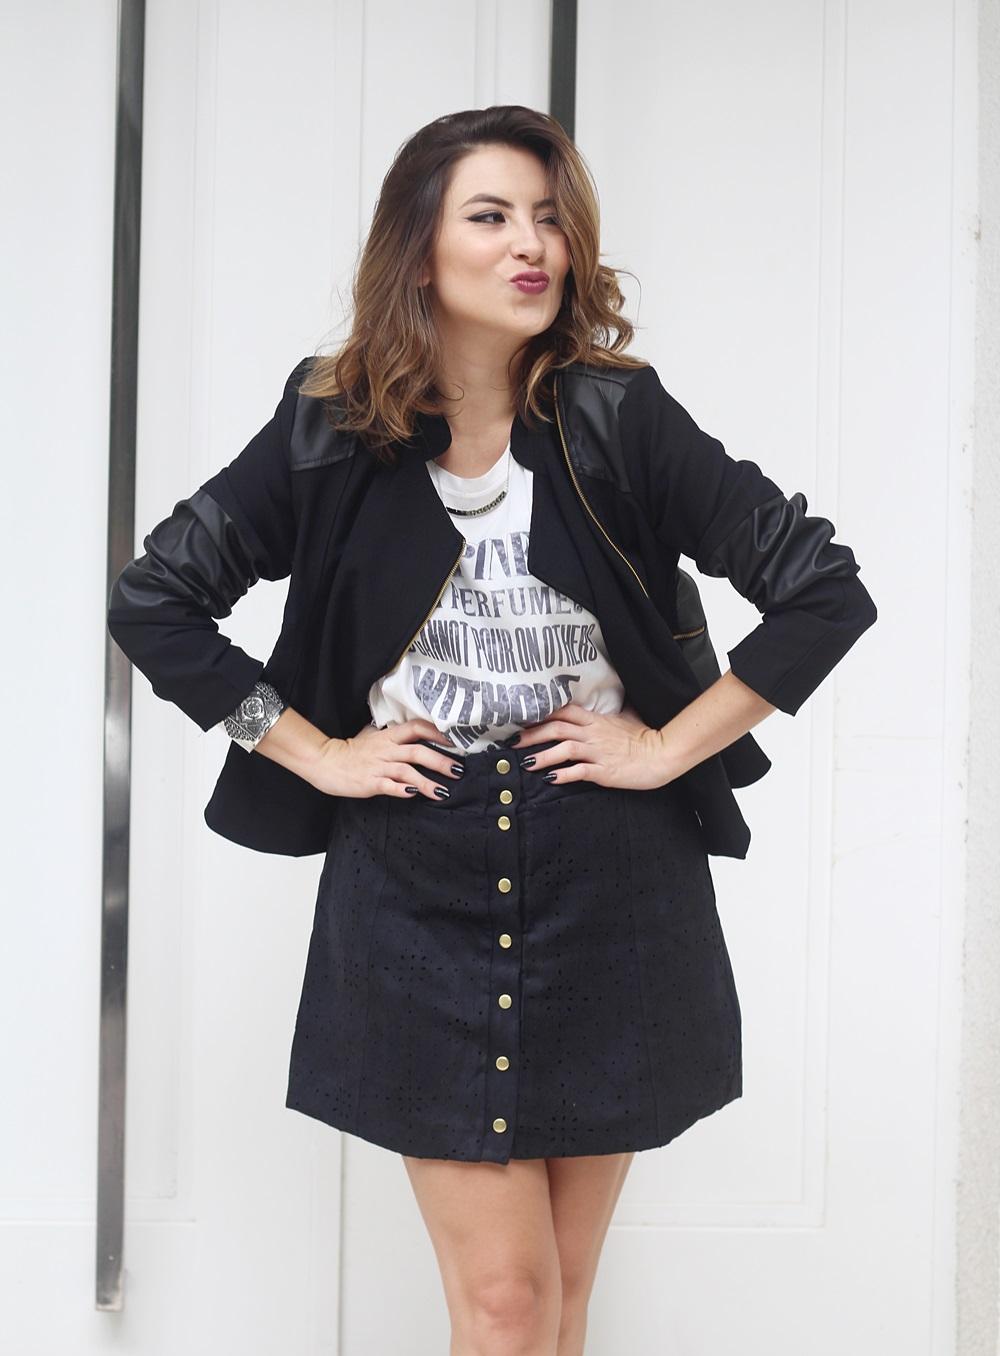 look-saia-botoes-suede-camiseta-estampada-jaqueta-couro-biker-blog-vanduarte-2